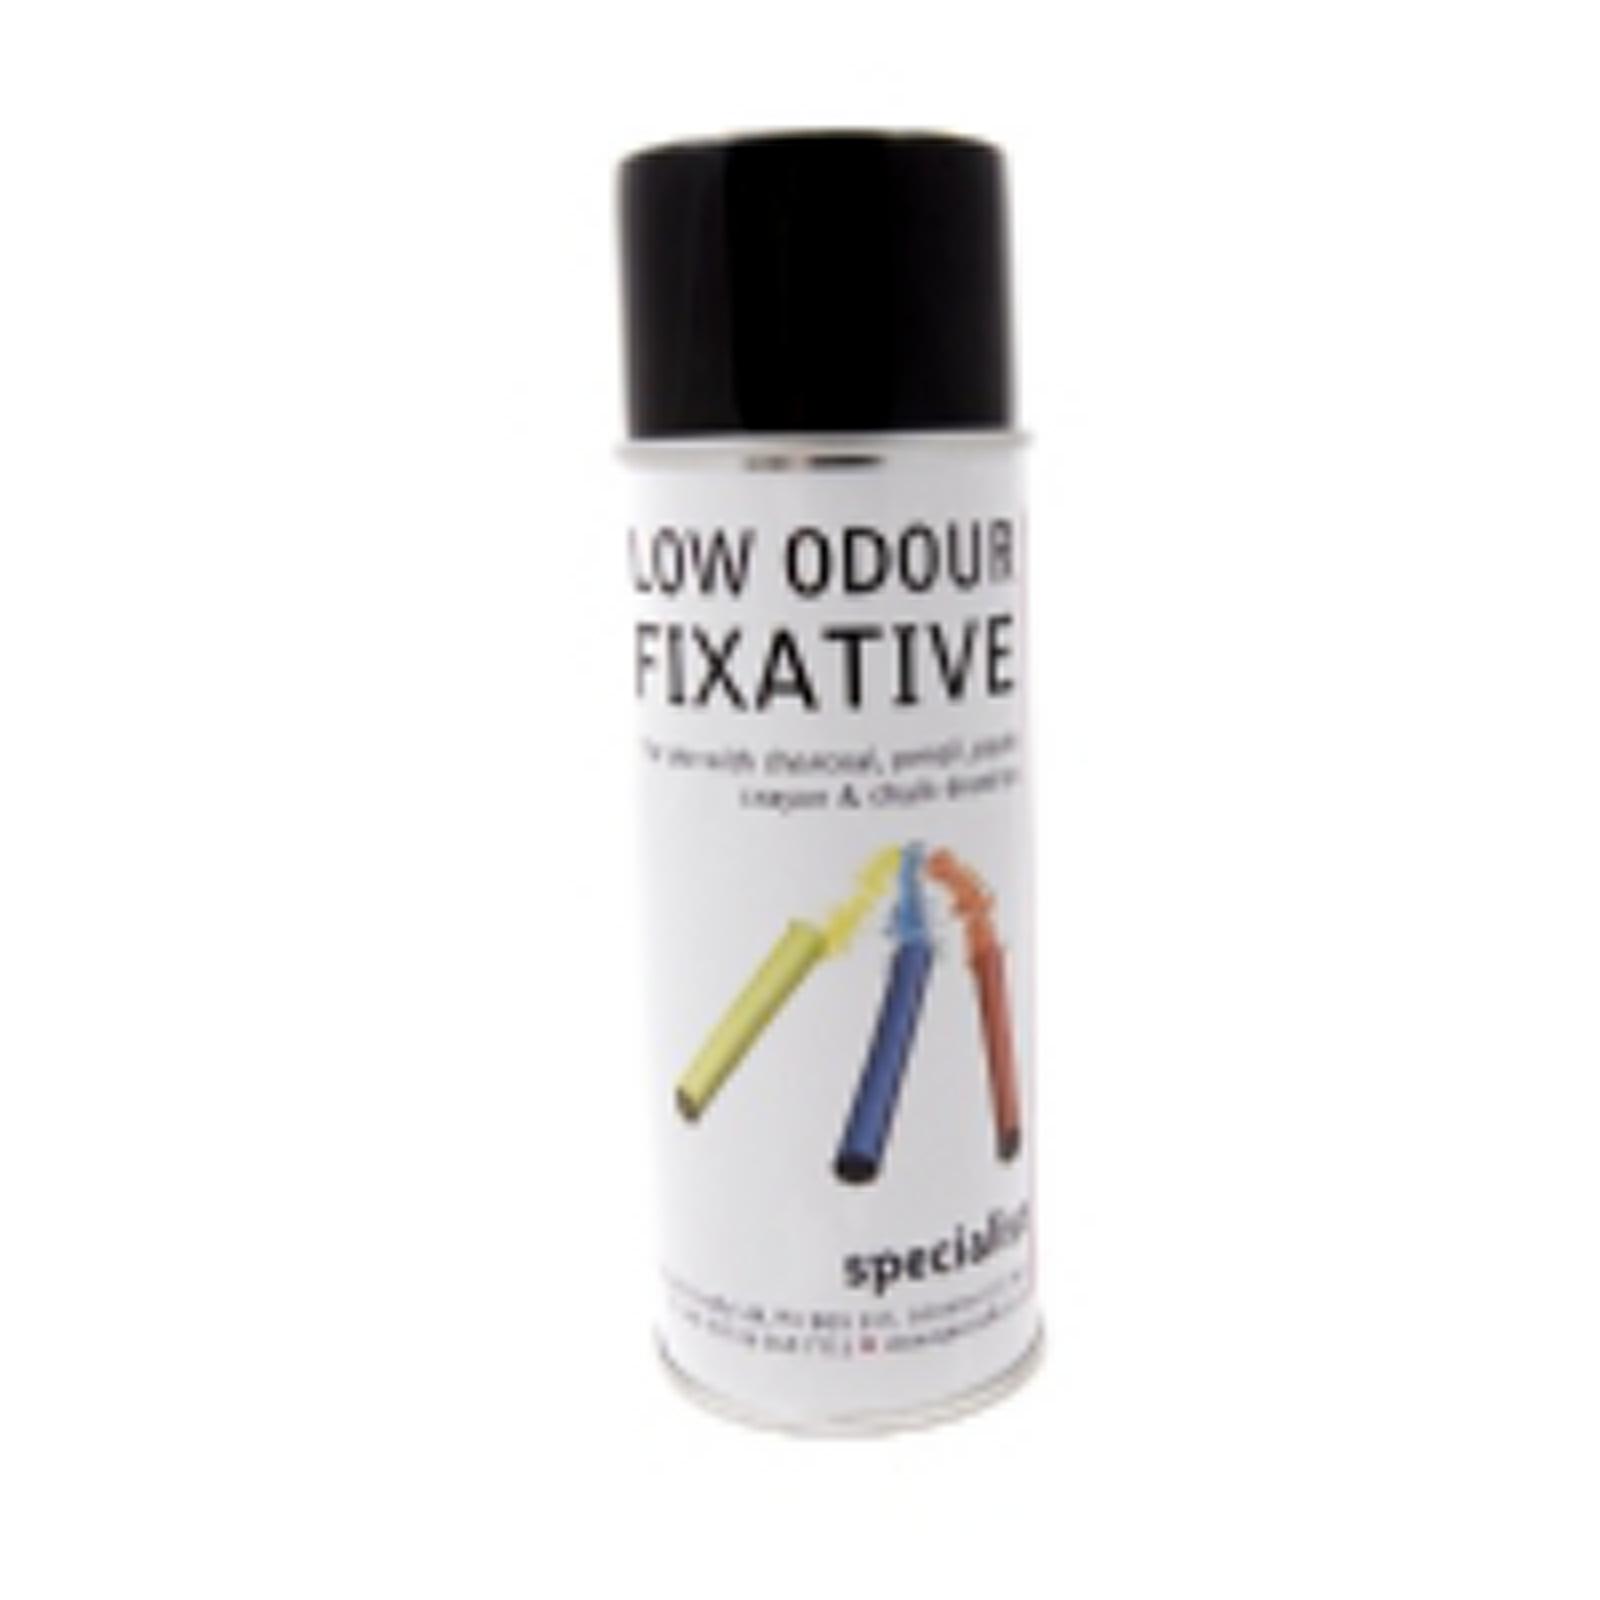 Spray Fixative 200ml